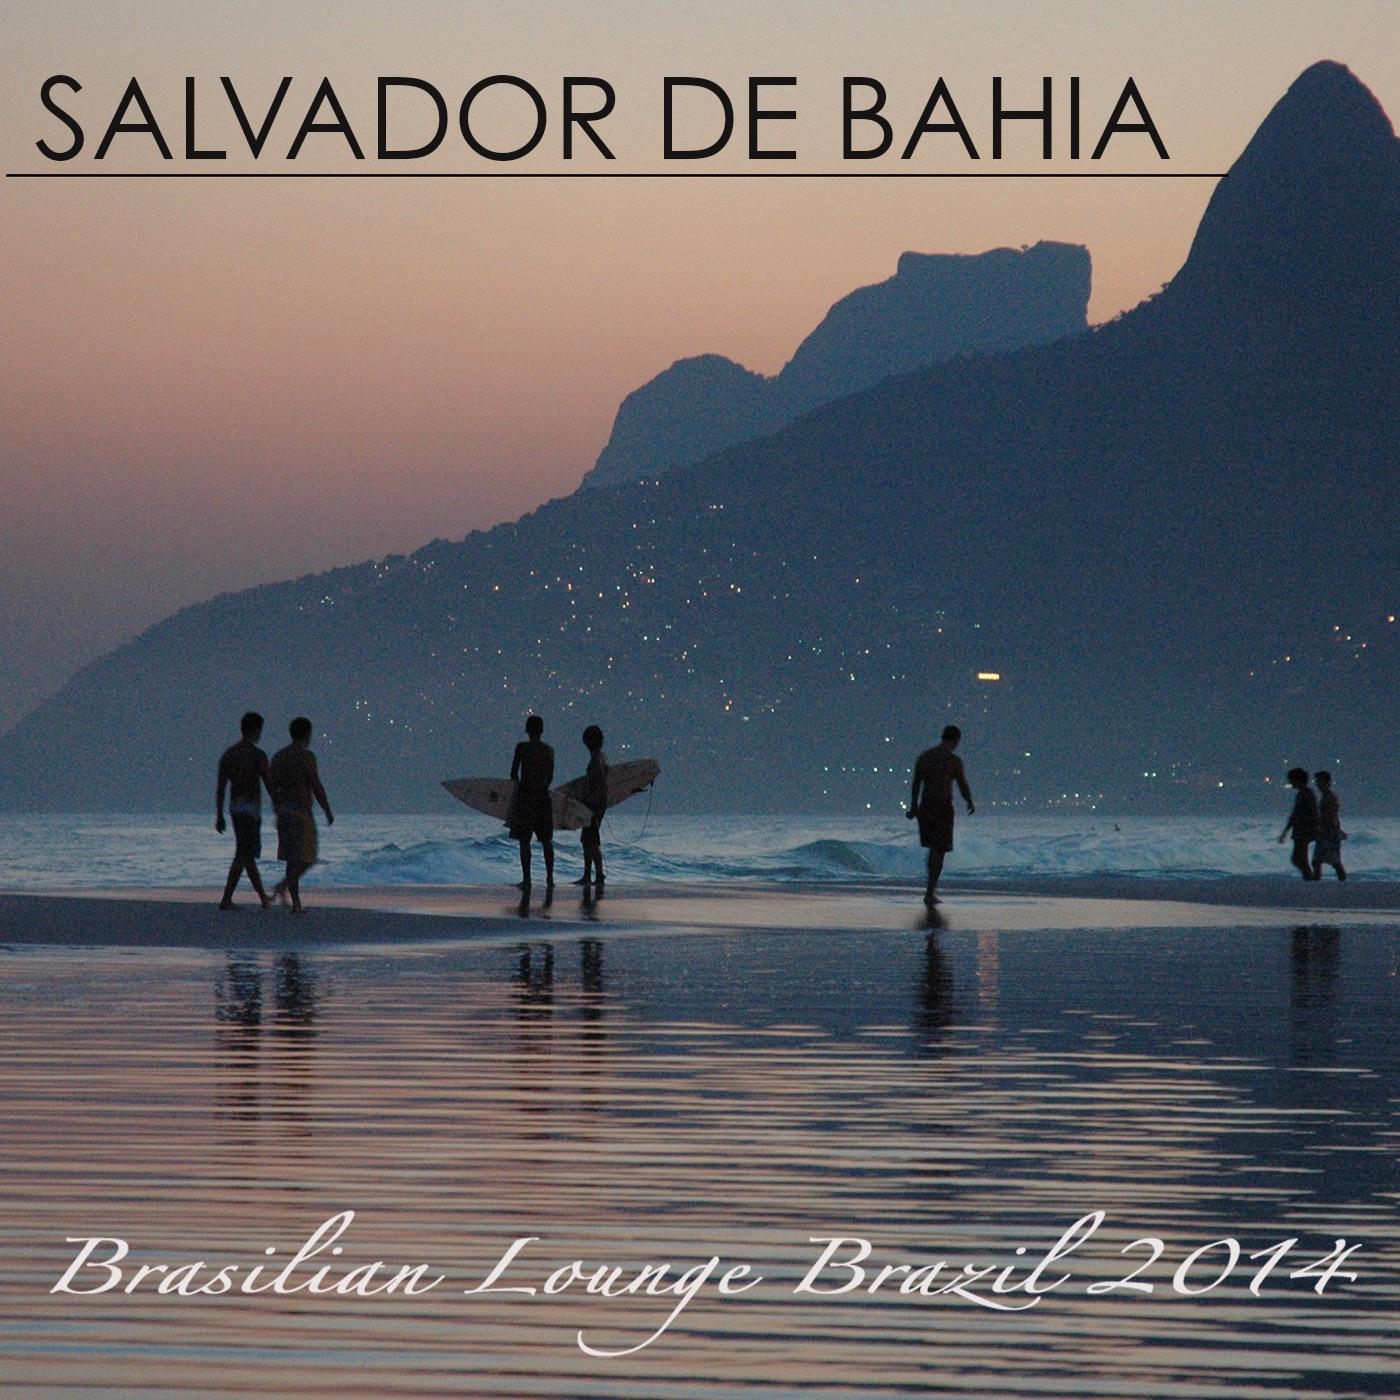 Brazil 2014 (Salvador Brazil)